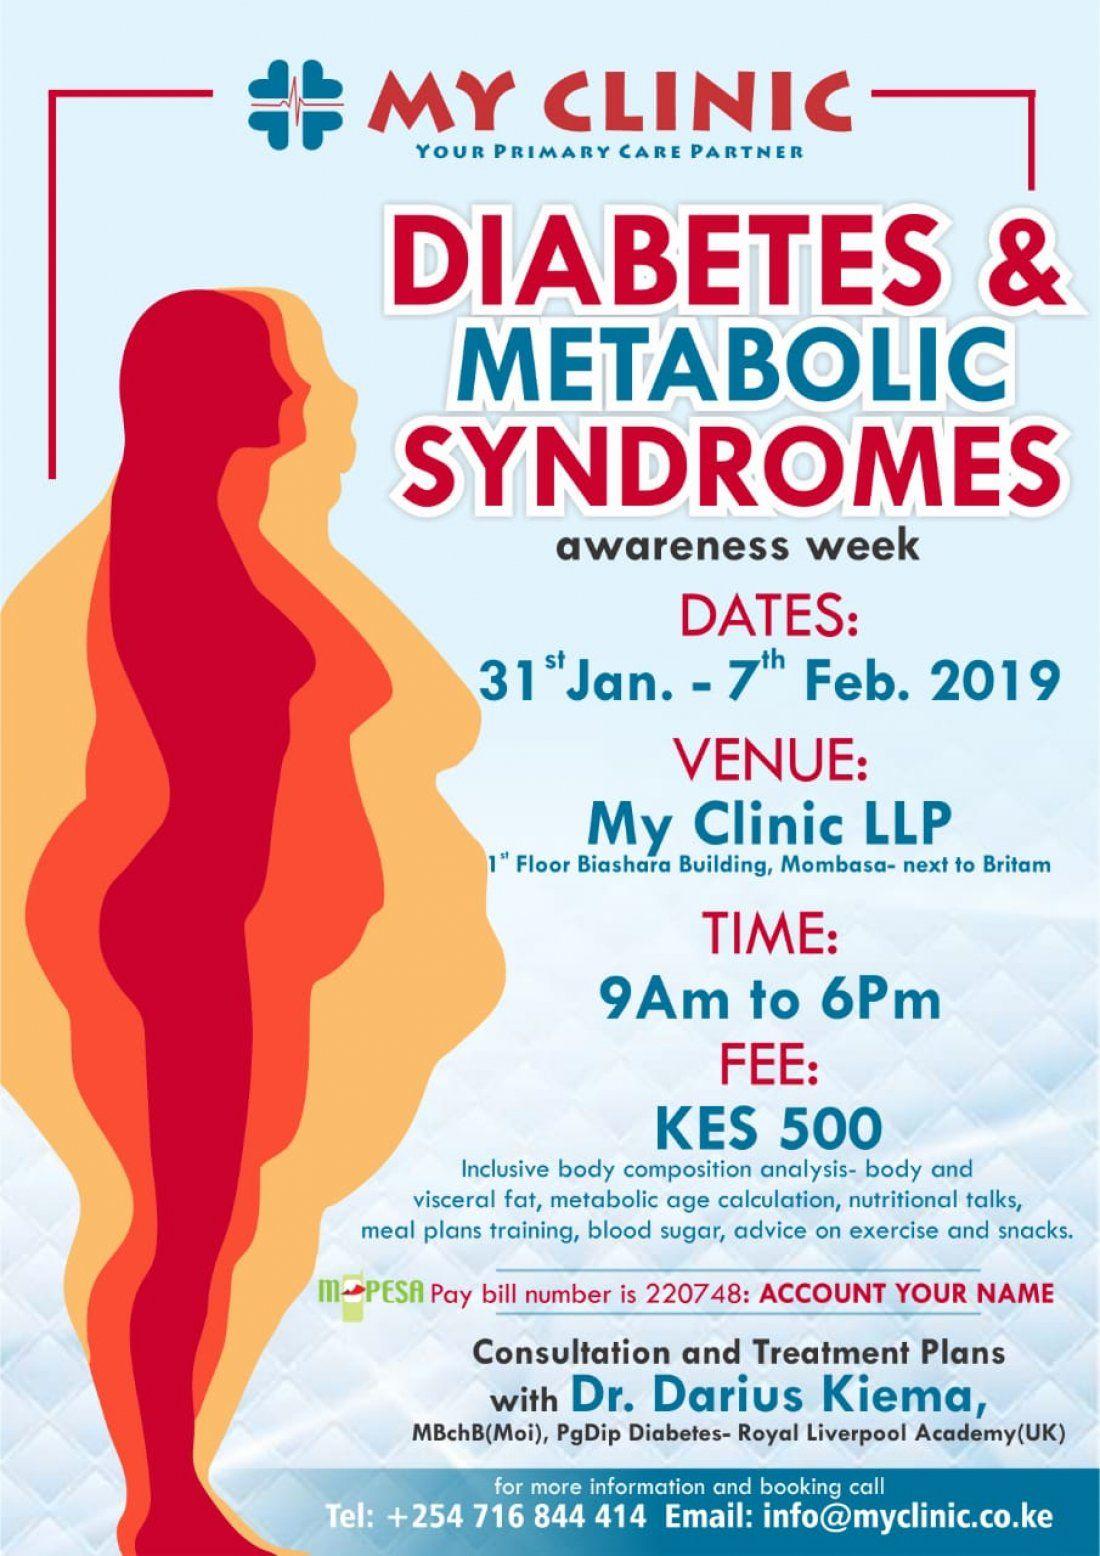 DIABETES AND METABOLIC SYNDROMES AWARENESS WEEK